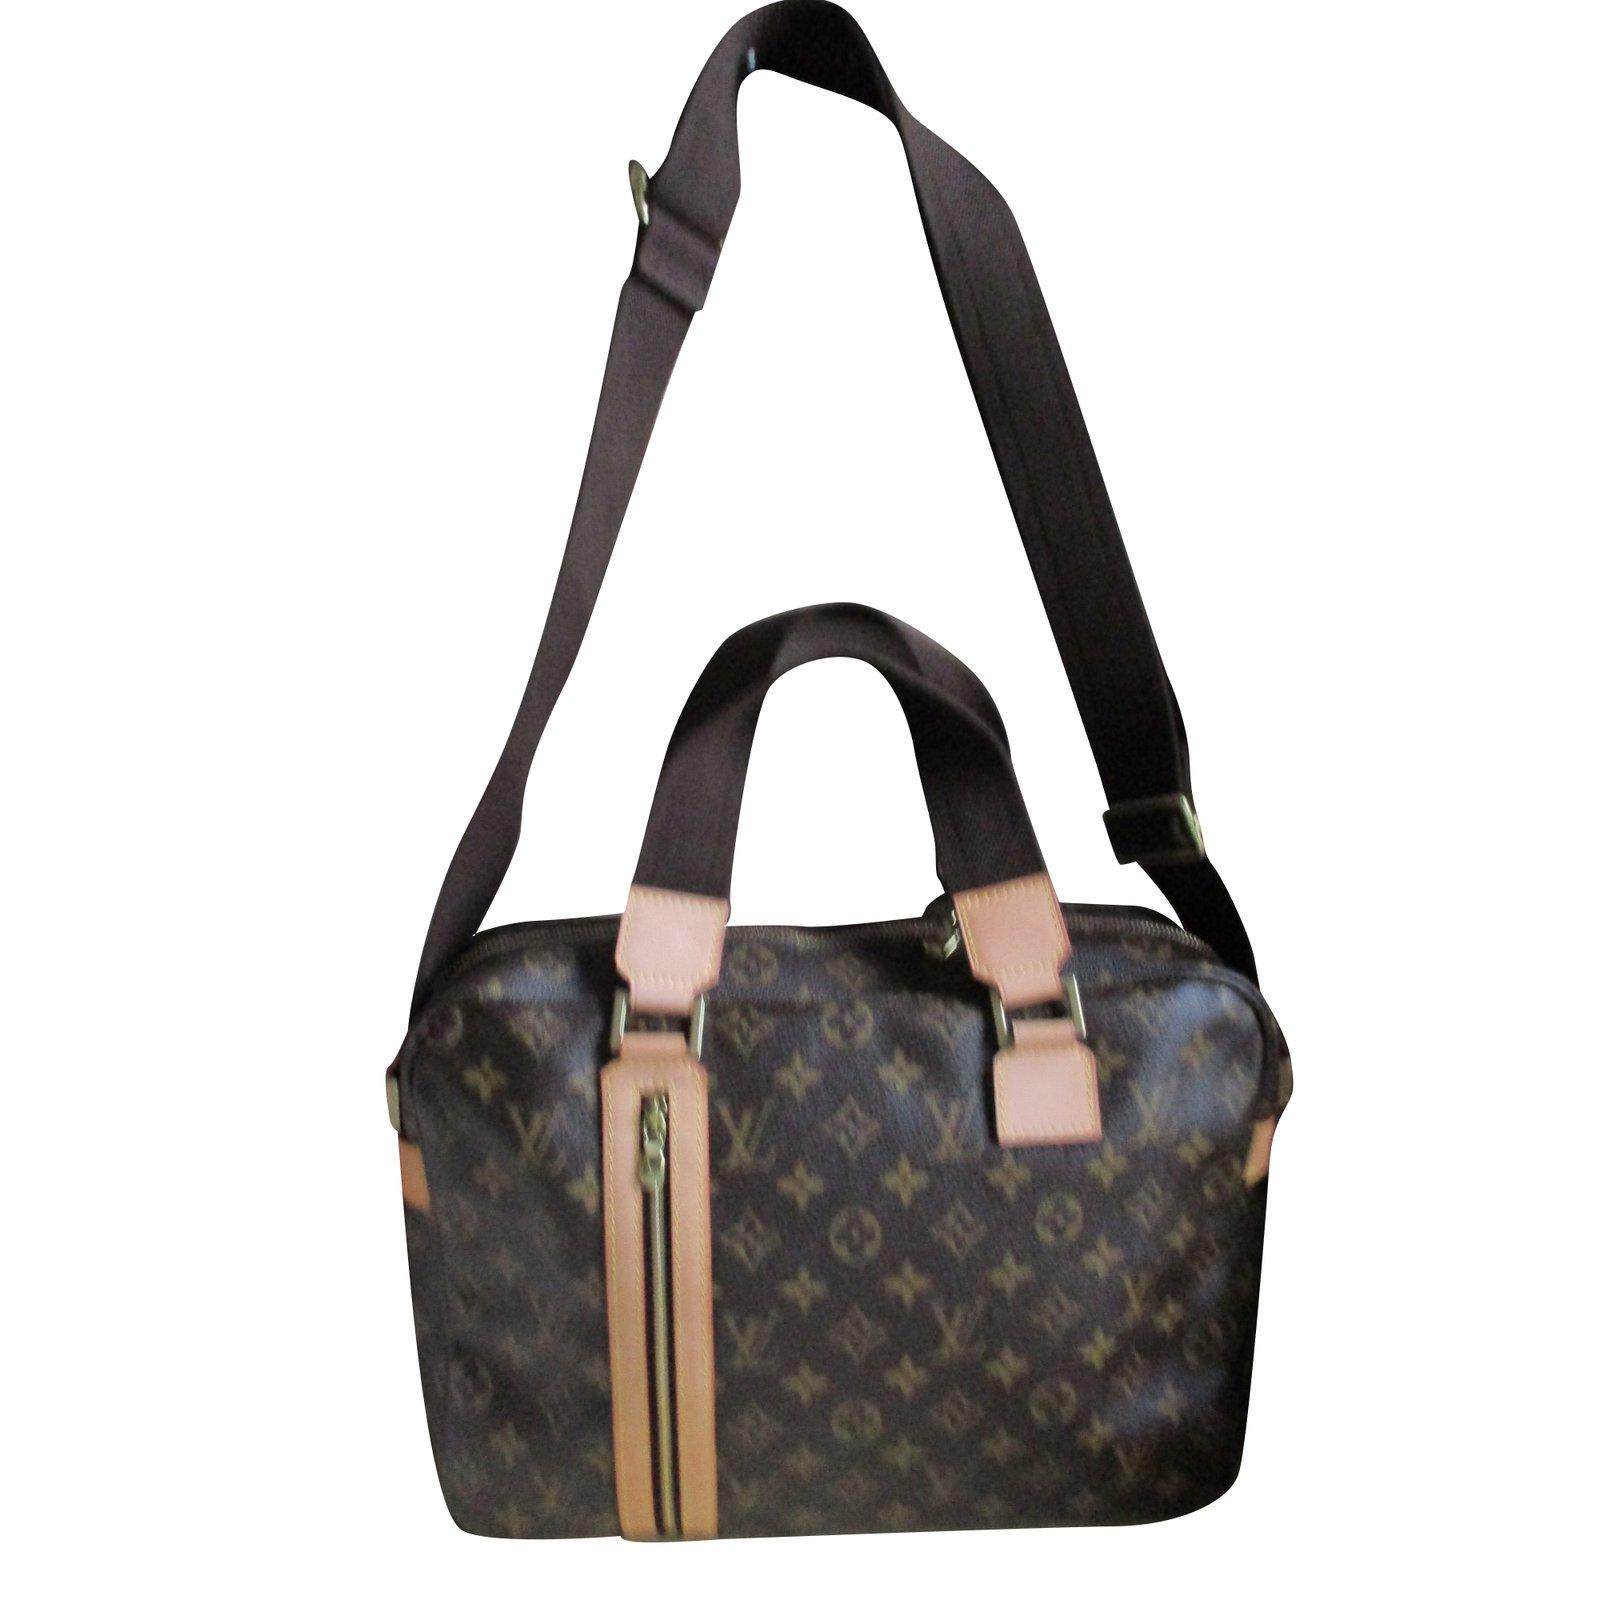 super popular 26d09 fd9f1 Bag, document holder, Backpack, Travel bag, laptop case, Louis Vuitton